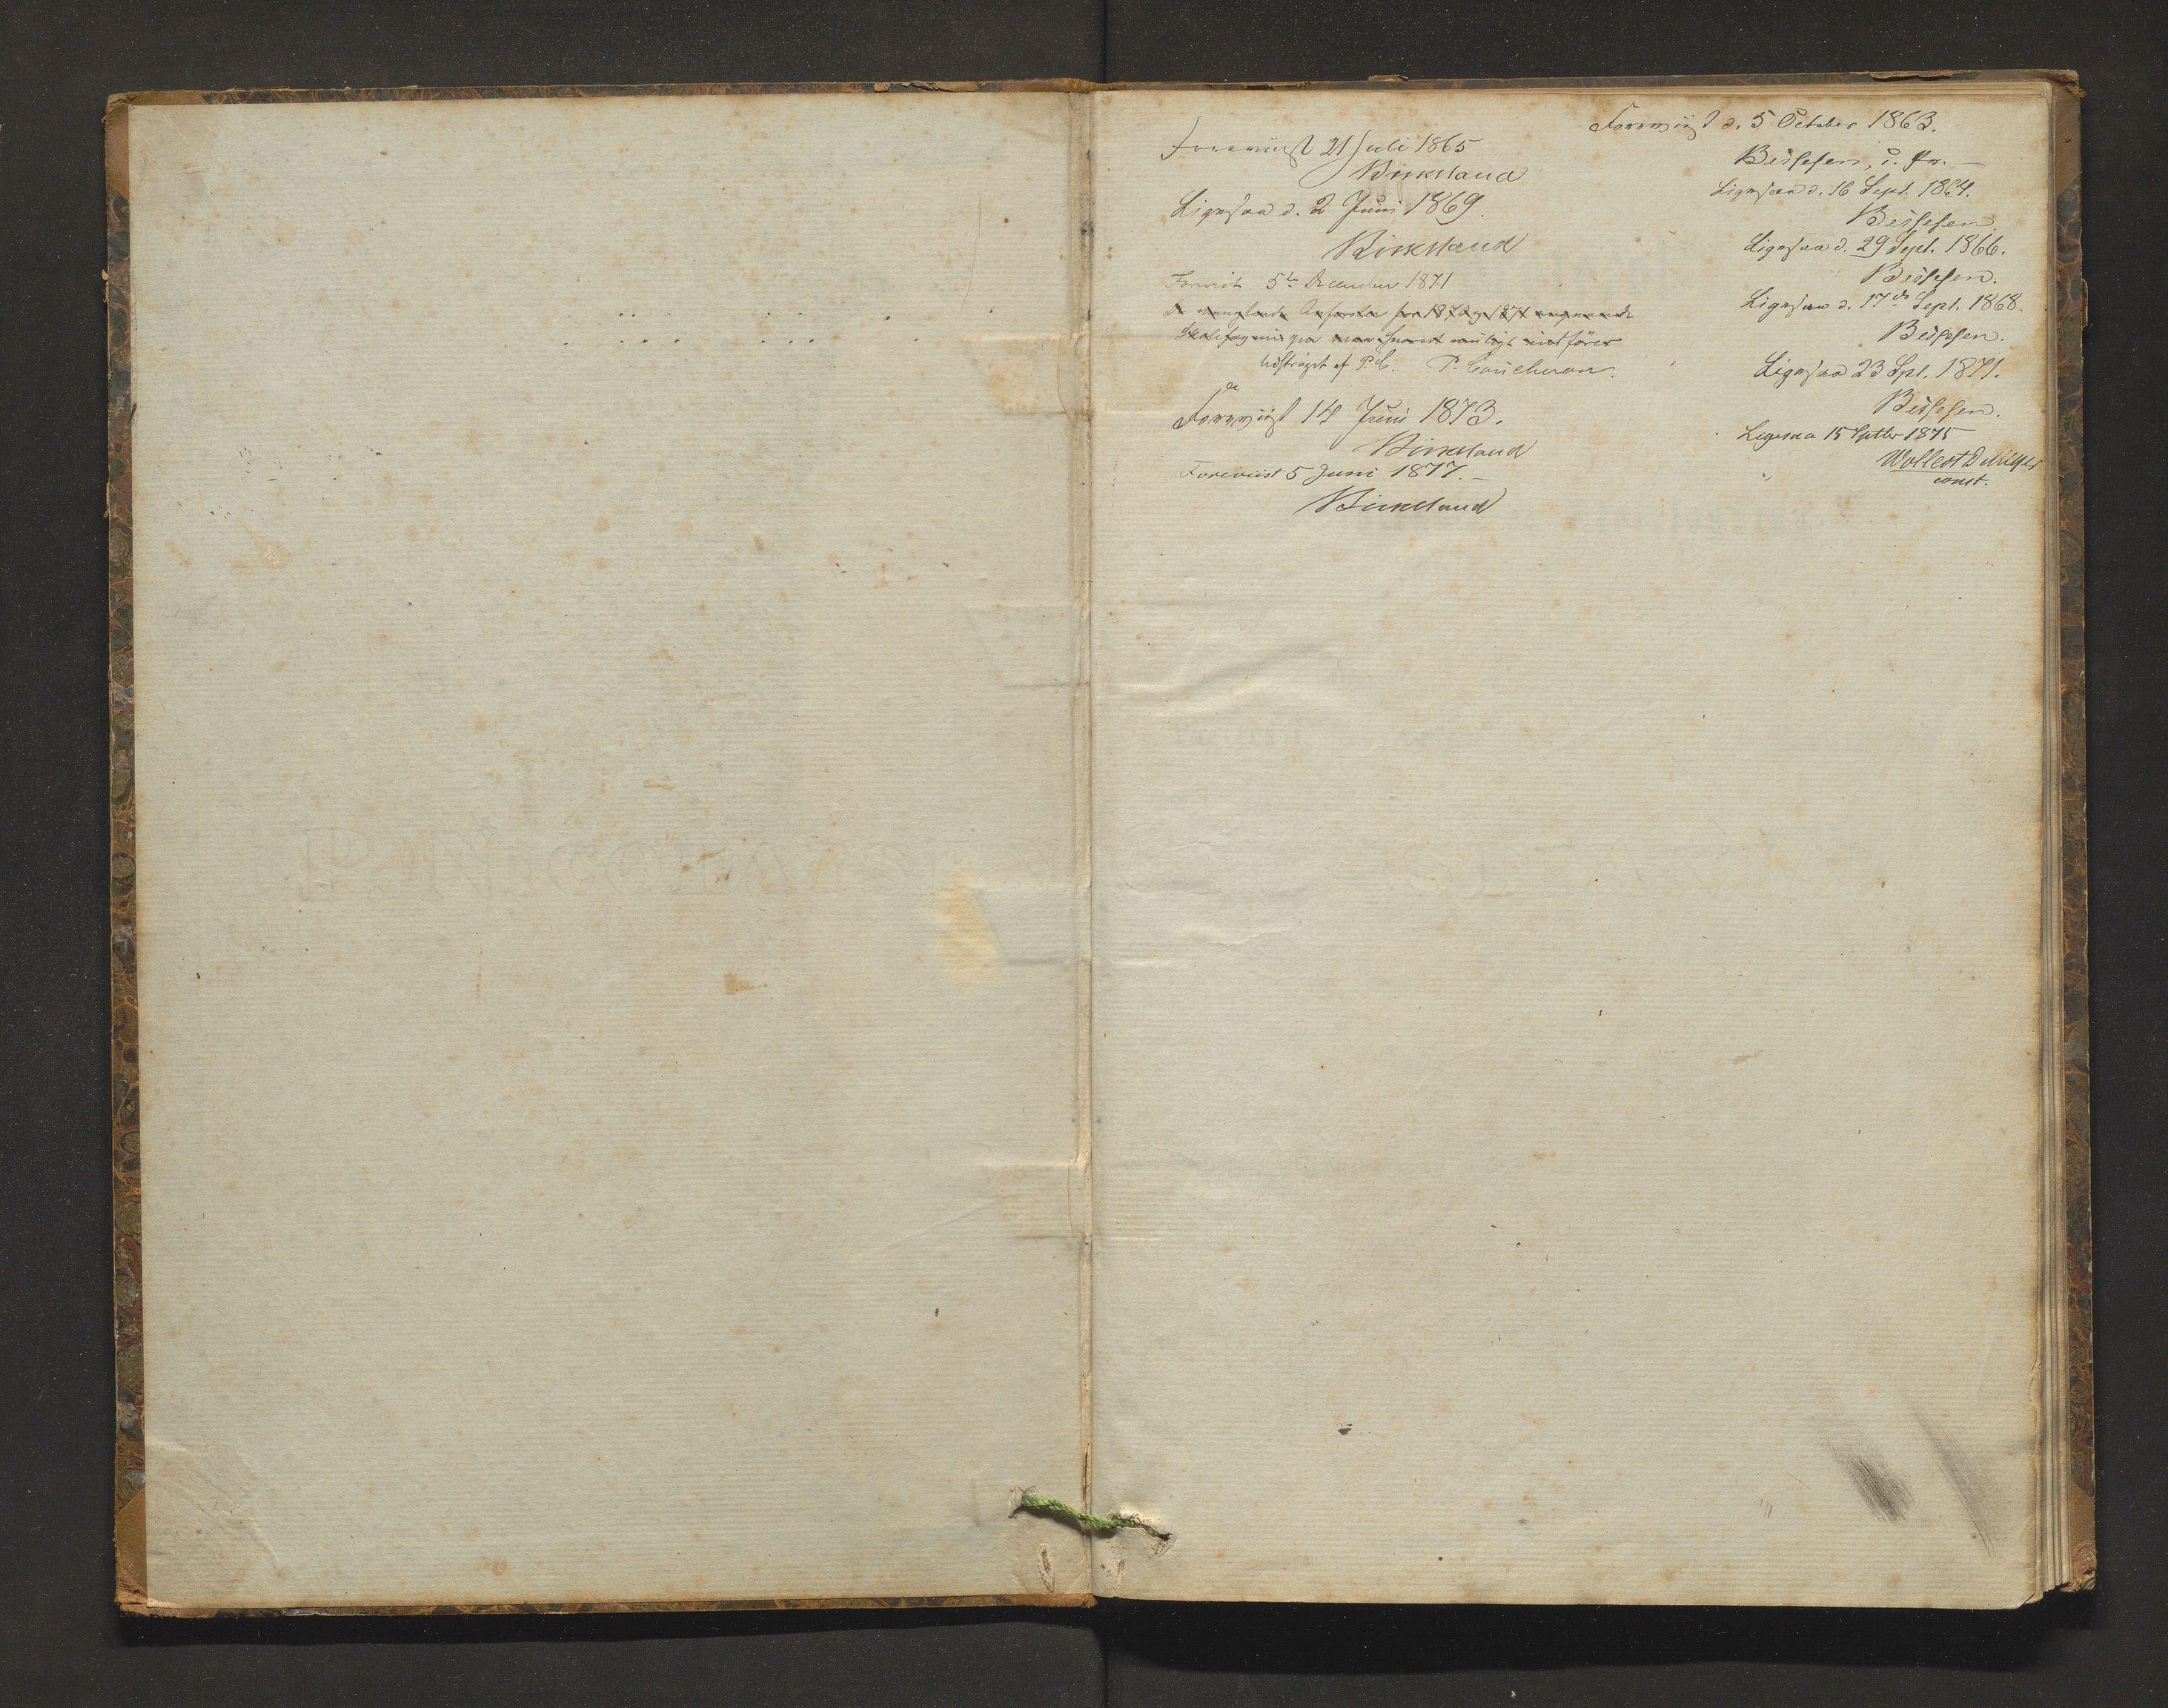 IKAH, Fitjar kommune. Barneskulane, F/Fa/L0006: Skuleprotokoll for Rimbereid krins i Fitje prestegjeld, 1863-1877